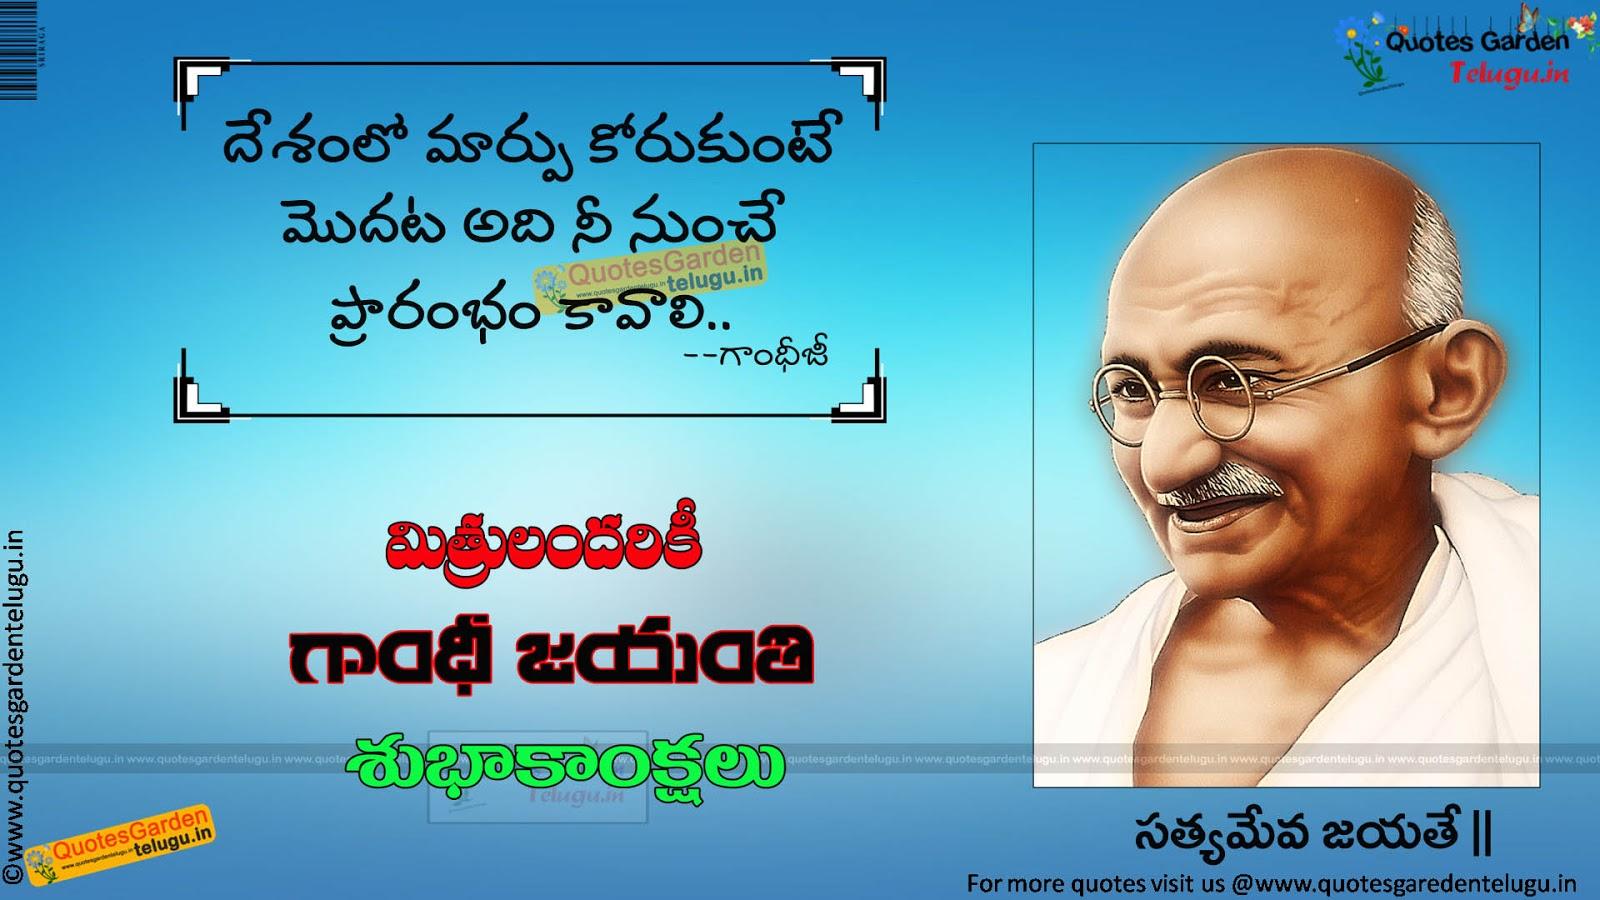 Gandhi Jayanti Quotes Greetings Wishes In Telugu Quotes Garden